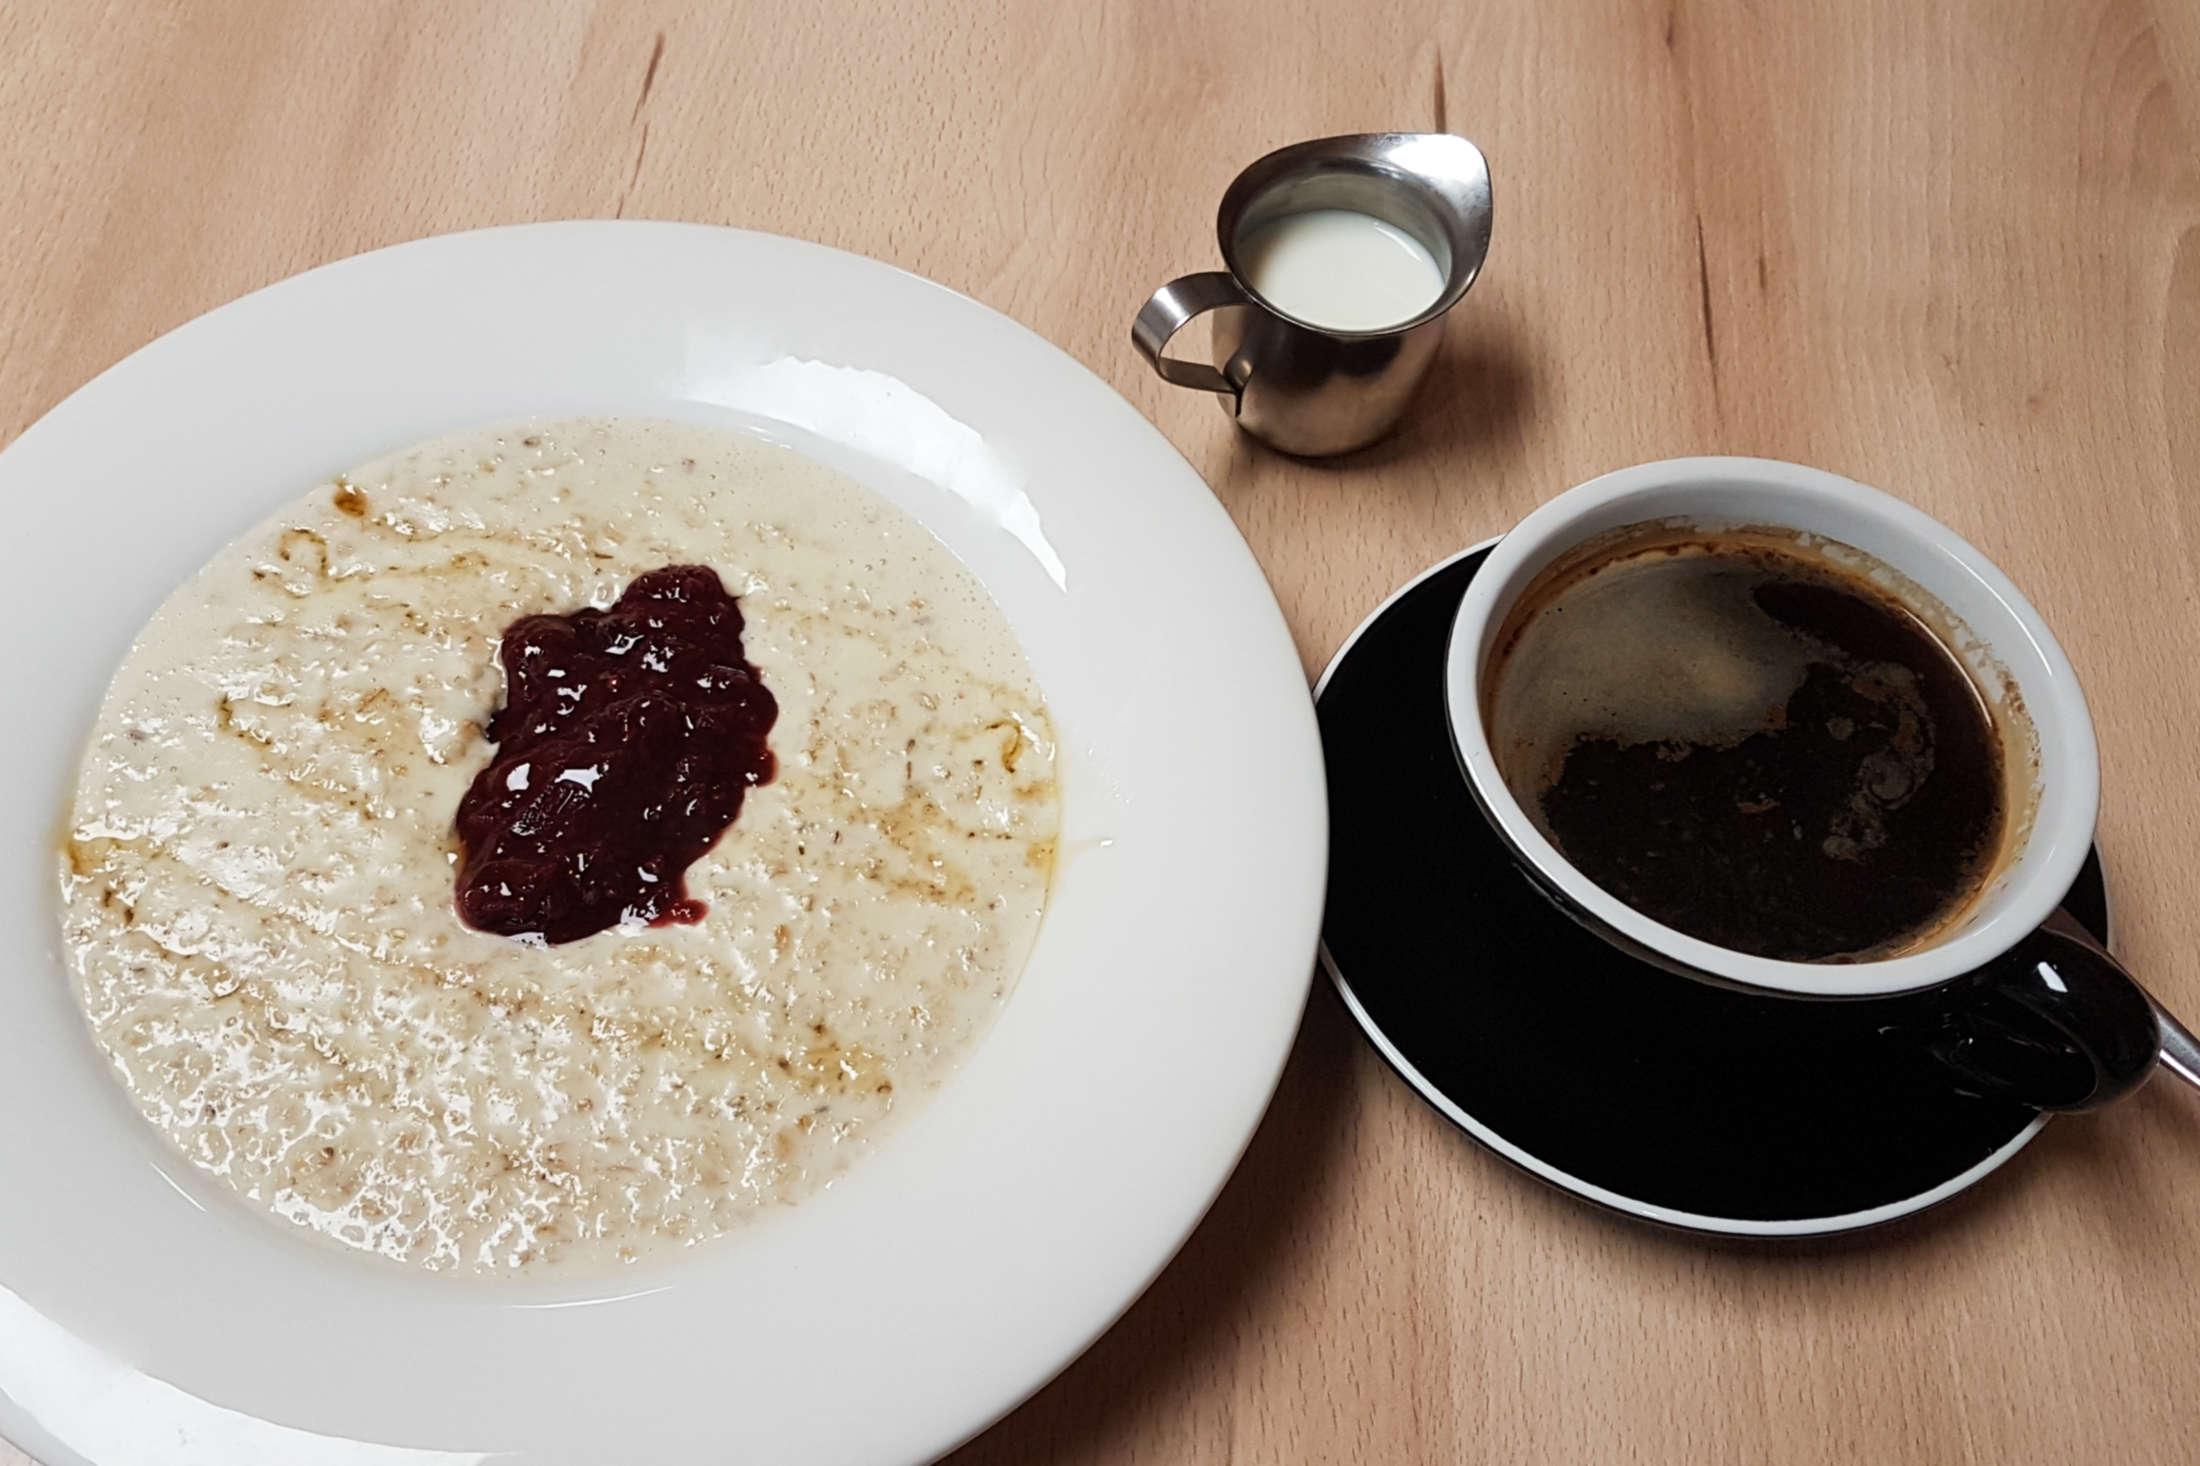 SaMick coffee and porridge